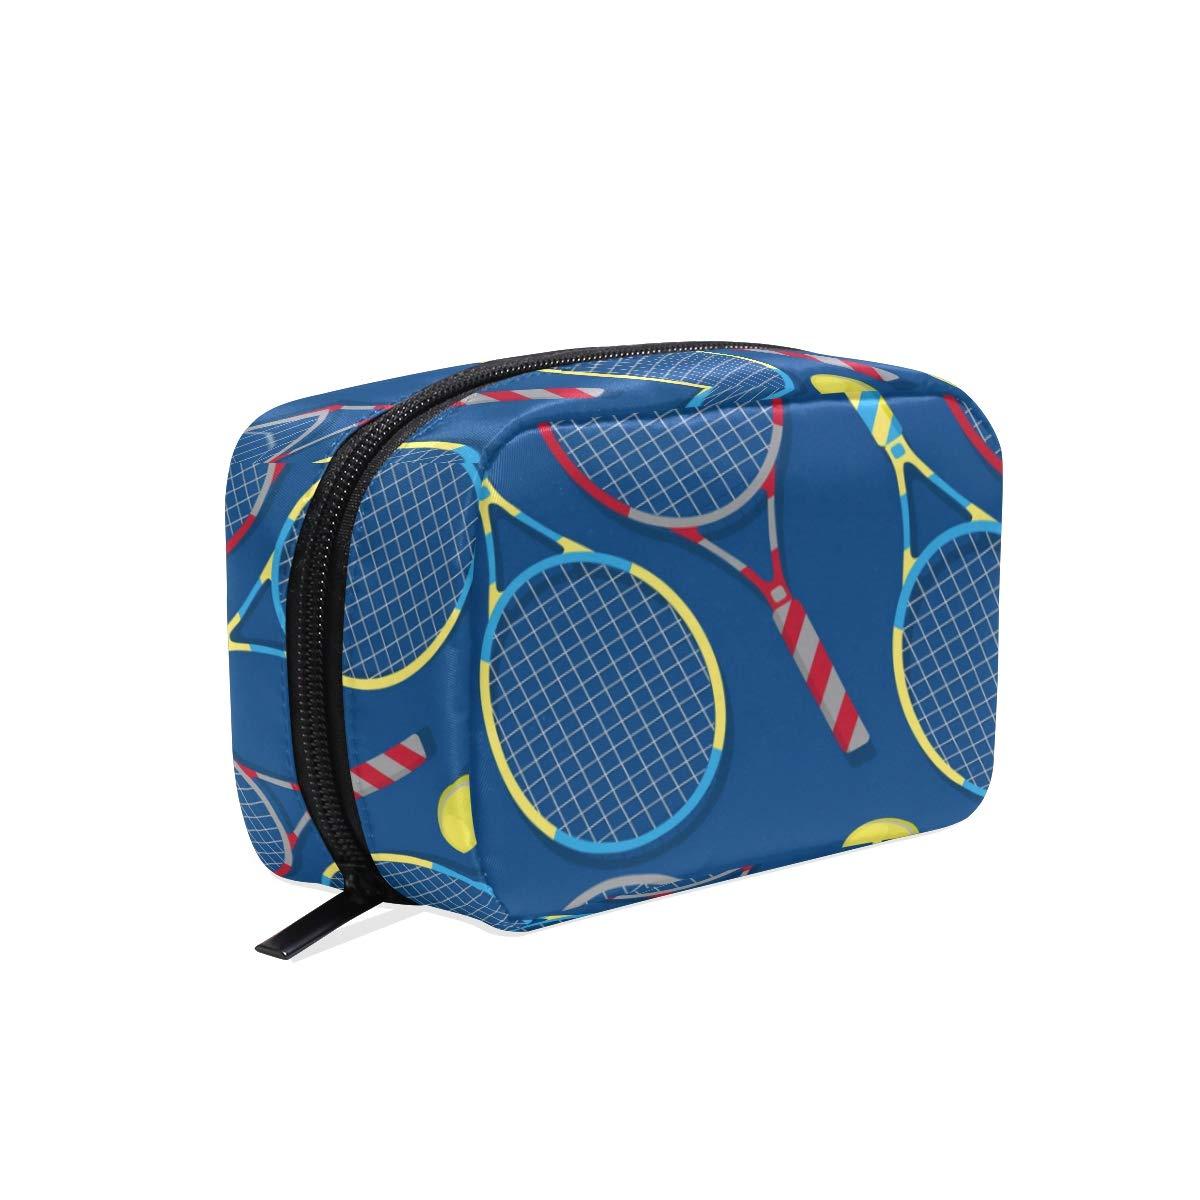 Cosmetic Makeup Bag Pouch Sport Tennis Ball Seamless Pattern Clutch